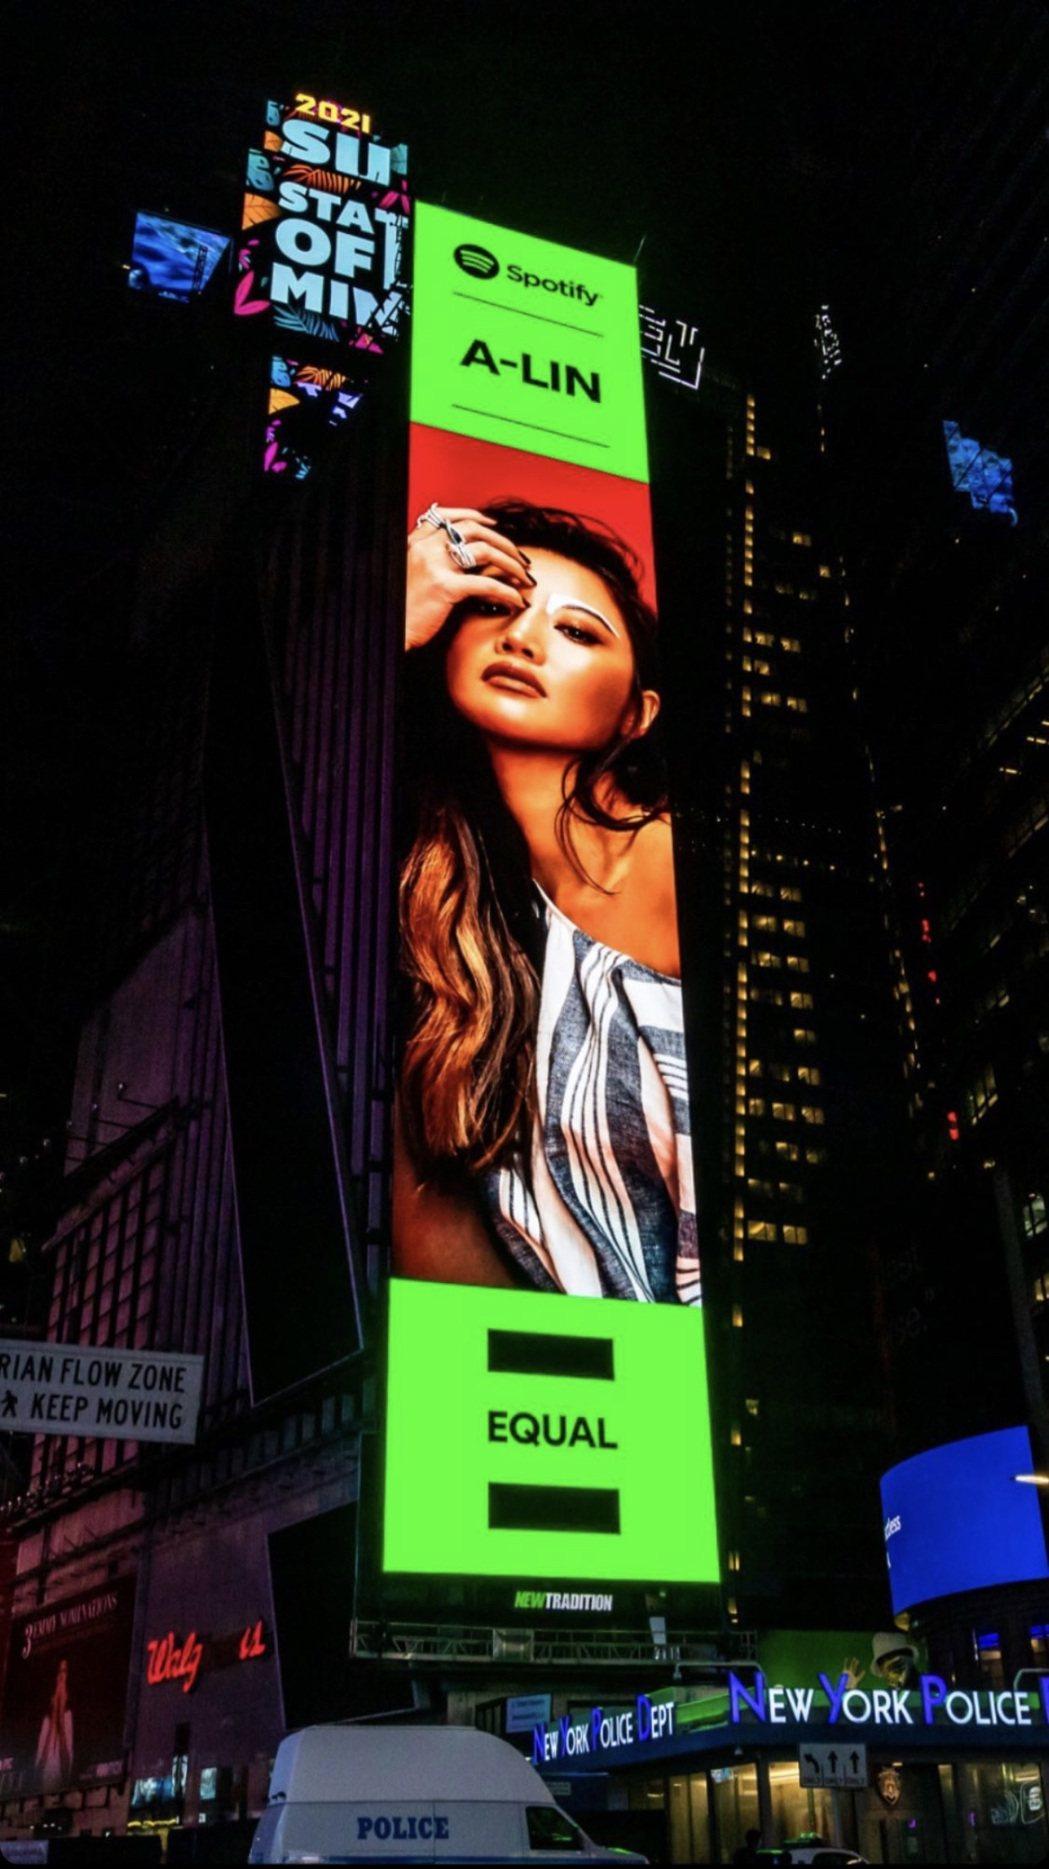 A-Lin登上美國紐約時代廣場巨幅LED,打趣有種「出國比賽」的感覺。圖/众悅娛